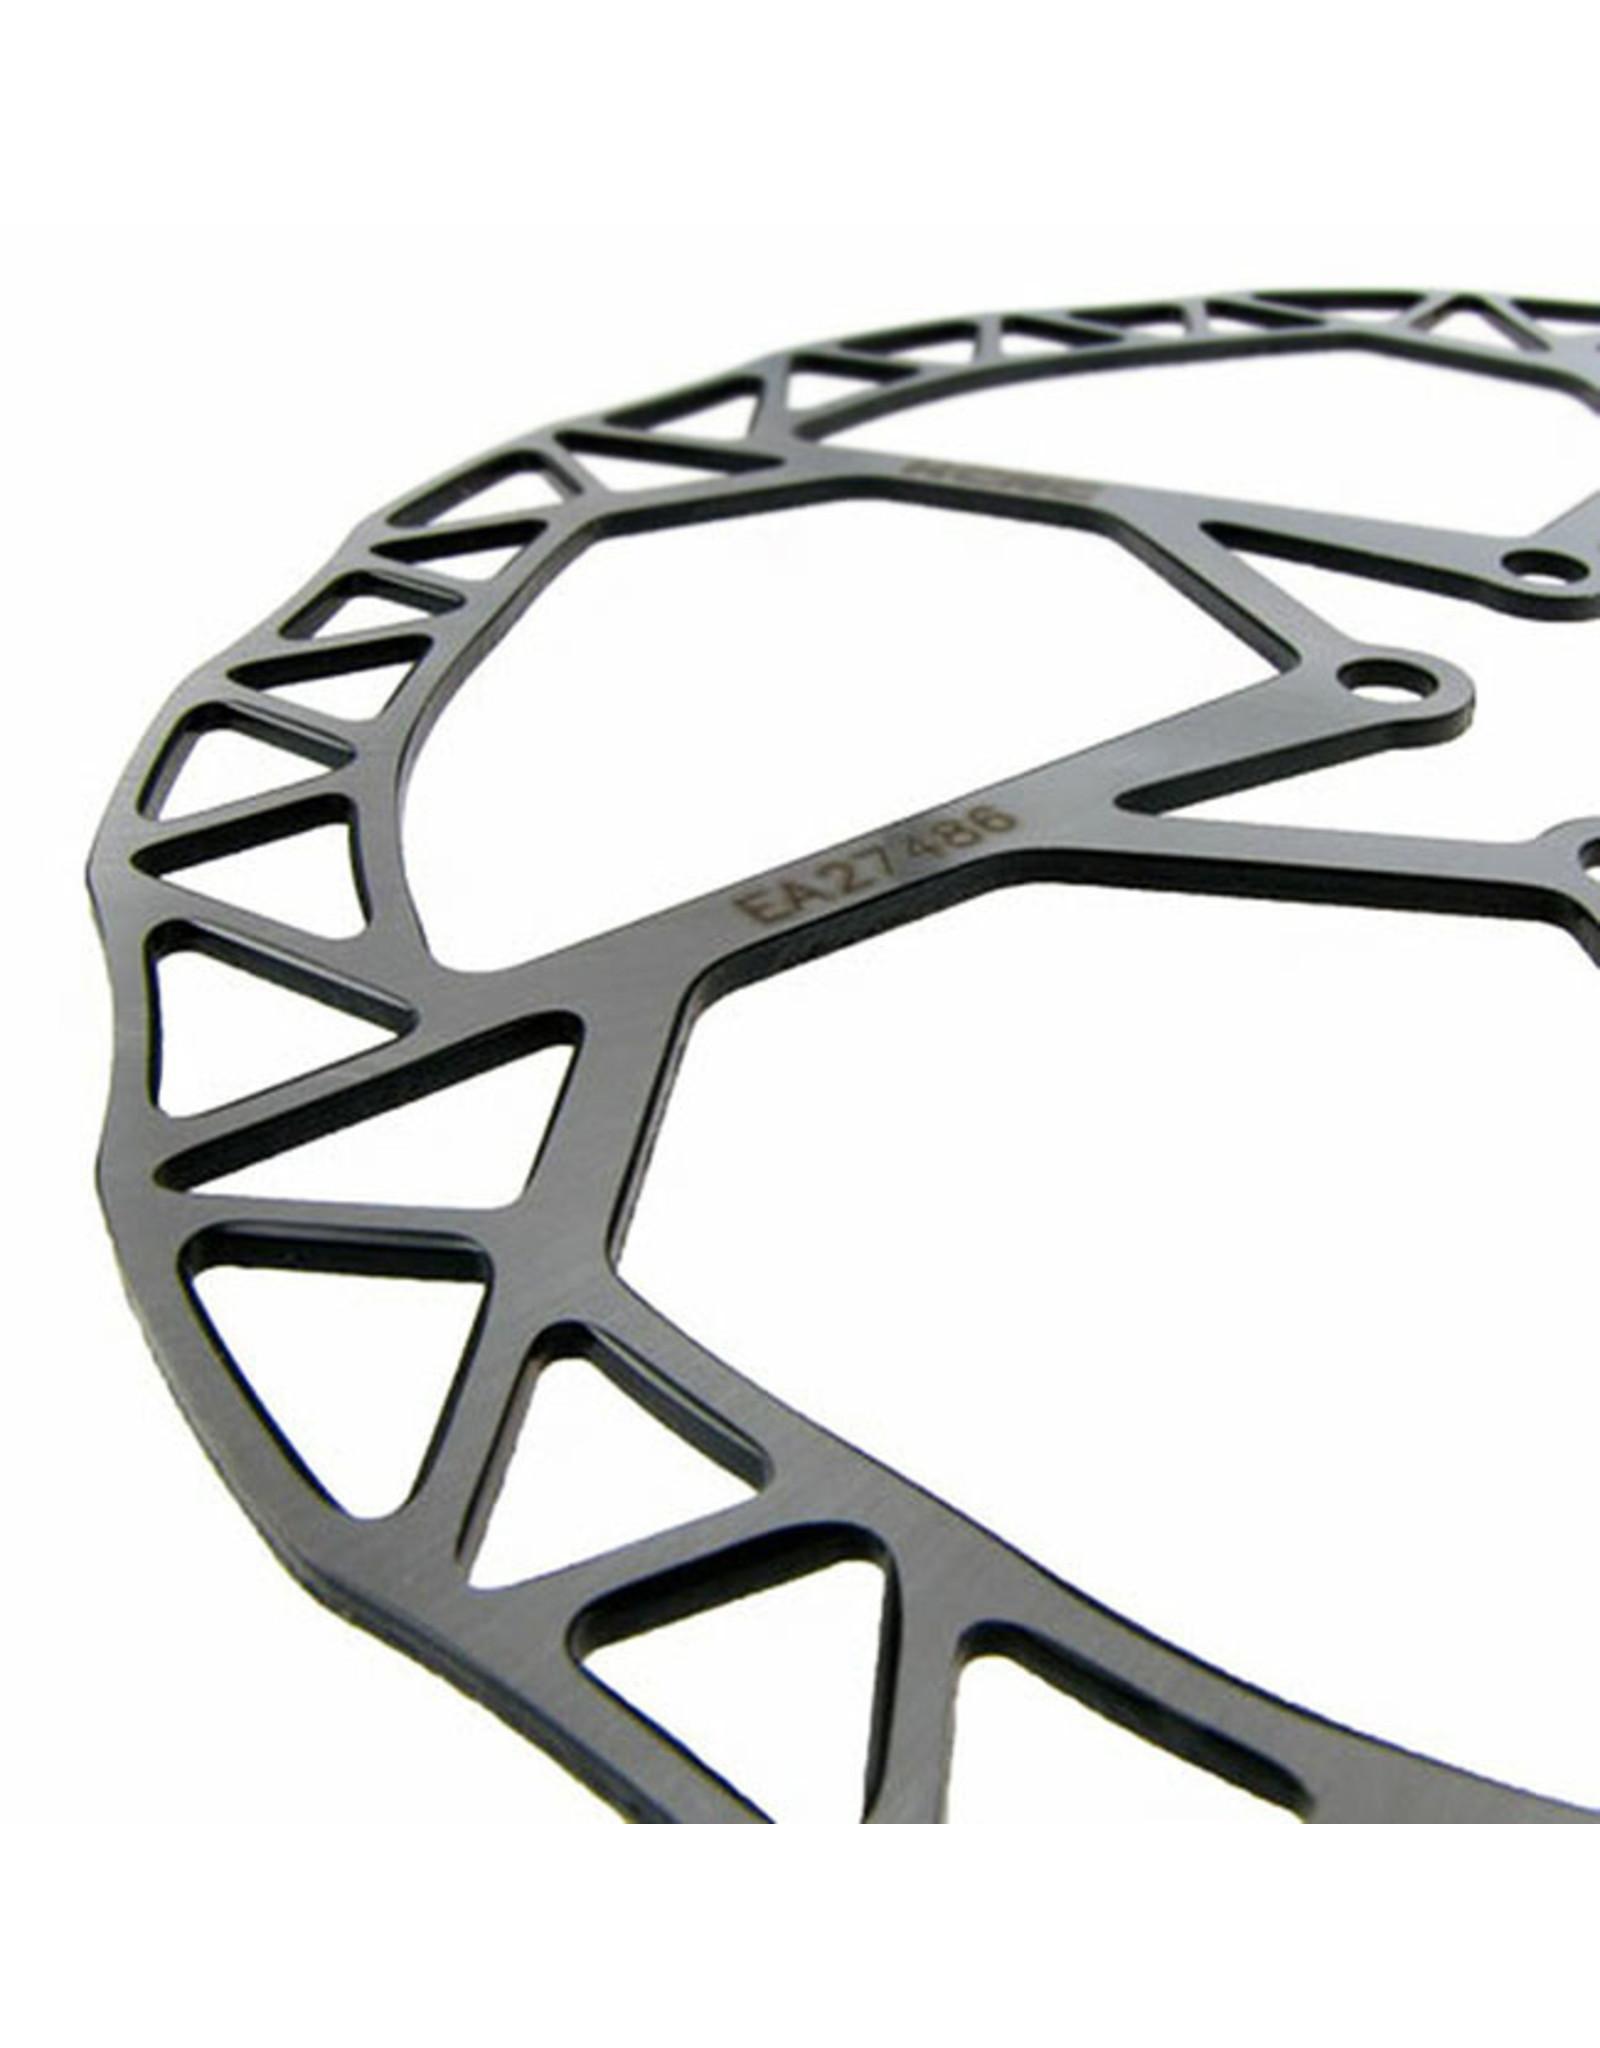 KCNC KCNC Razor Disc Rotor